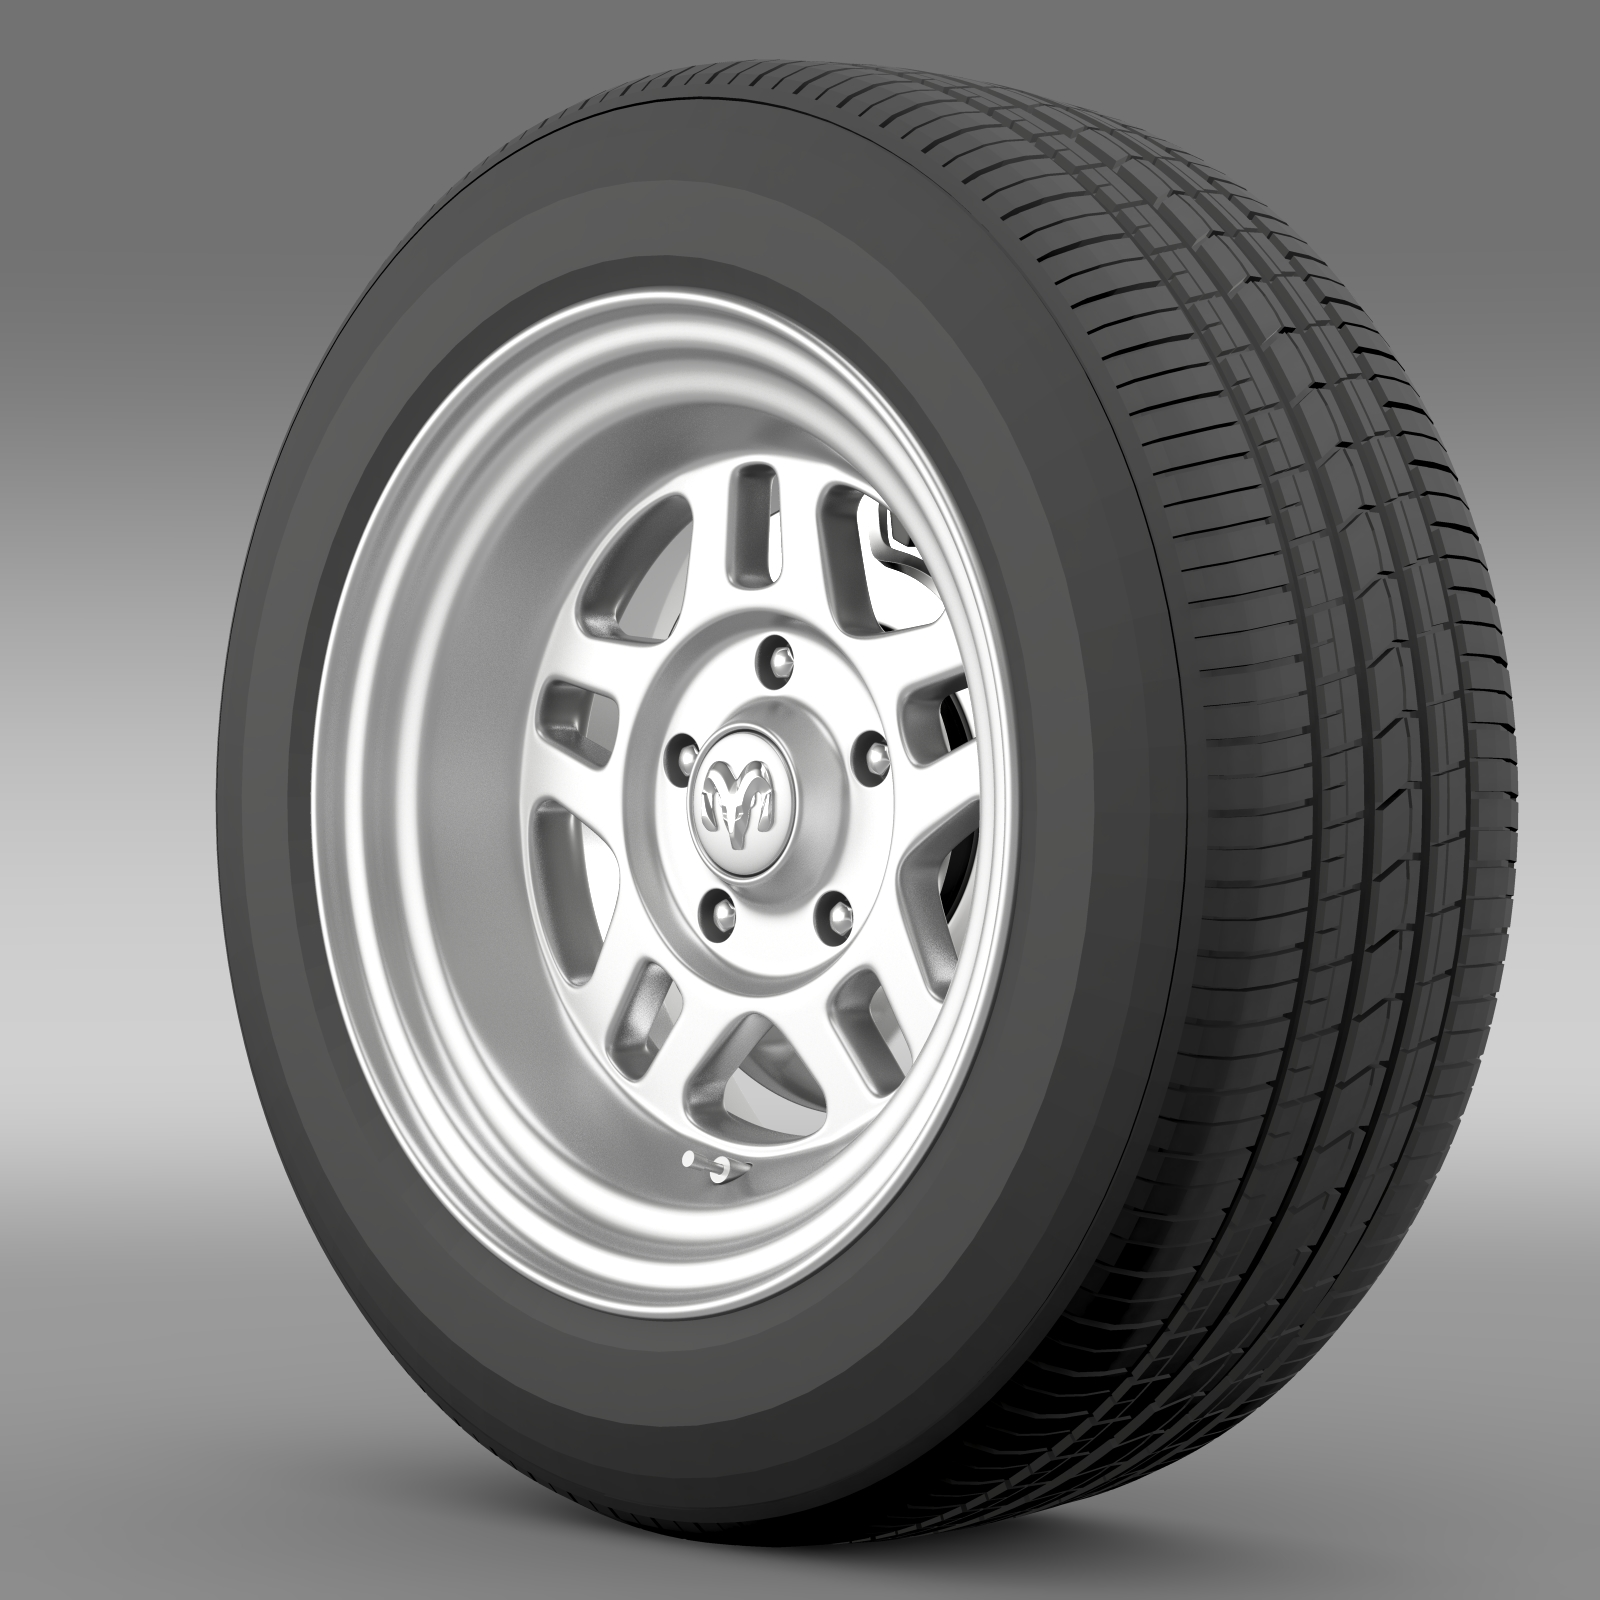 dodge challenger mopar wheel 3d model 3ds max fbx c4d lwo ma mb hrc xsi obj 212807